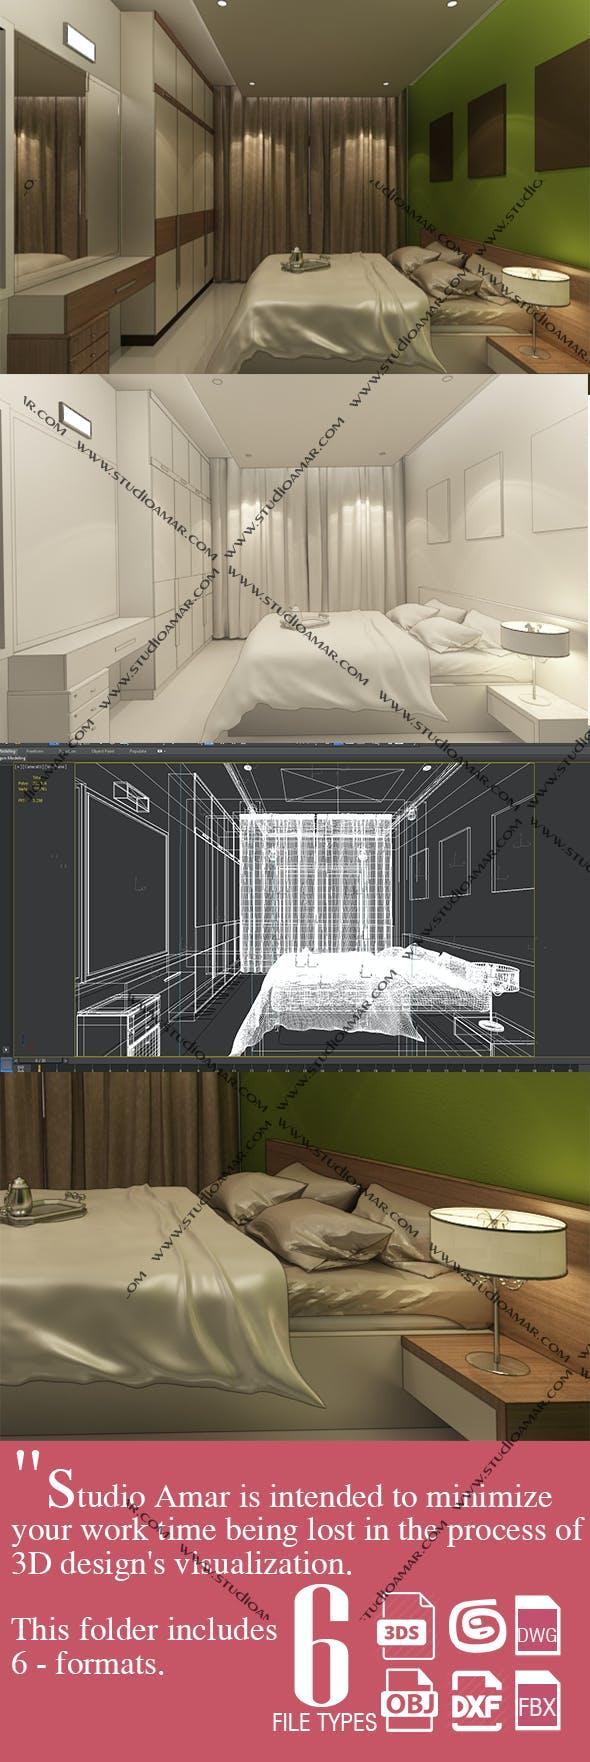 Realistic Bedroom 193 - 3DOcean Item for Sale